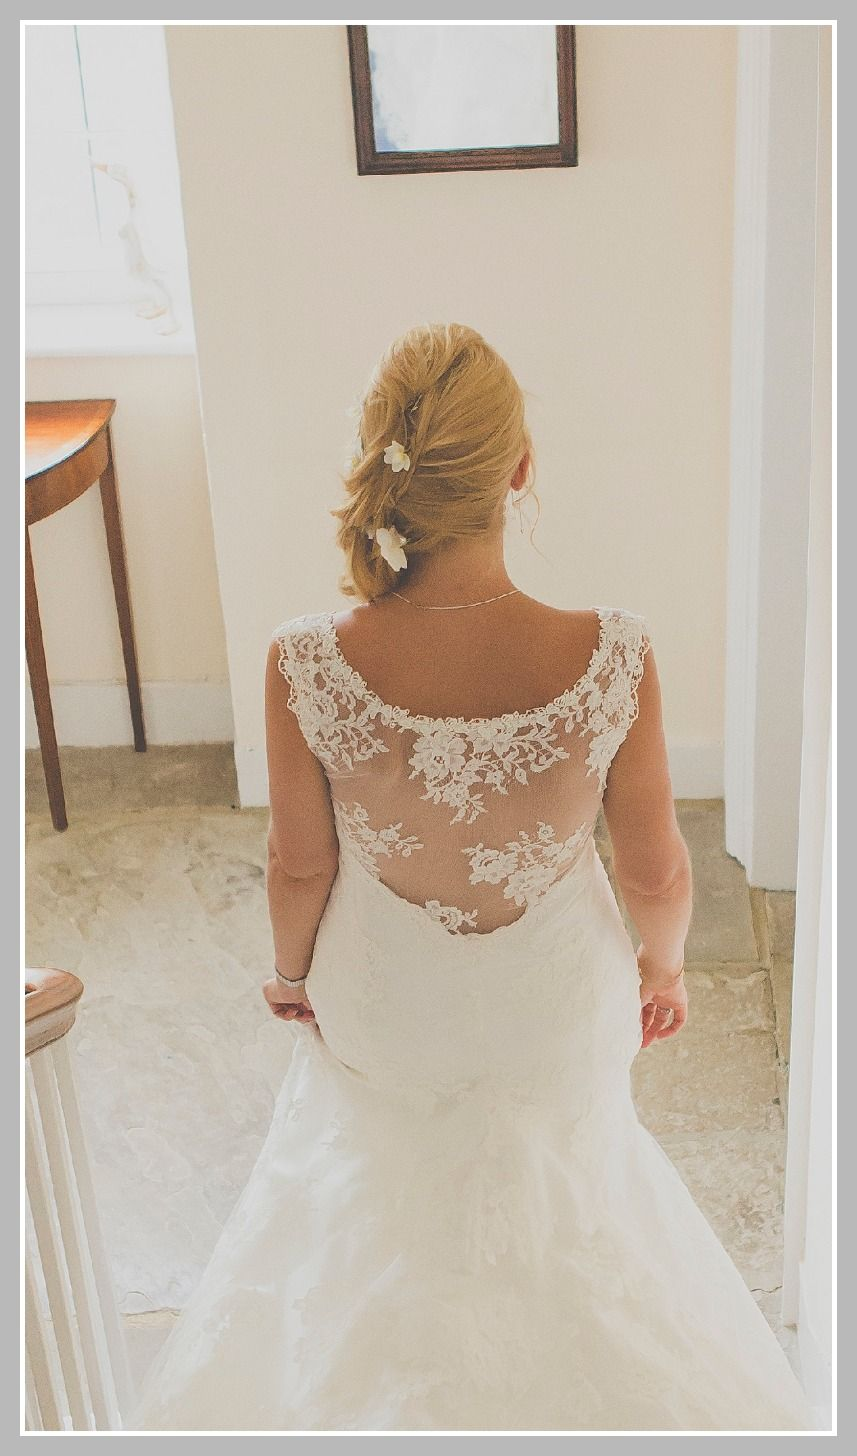 Lace back fishtail skirt lace wedding dress dana bolton www lace back fishtail skirt lace wedding dress dana bolton dressmakingdesign ombrellifo Gallery